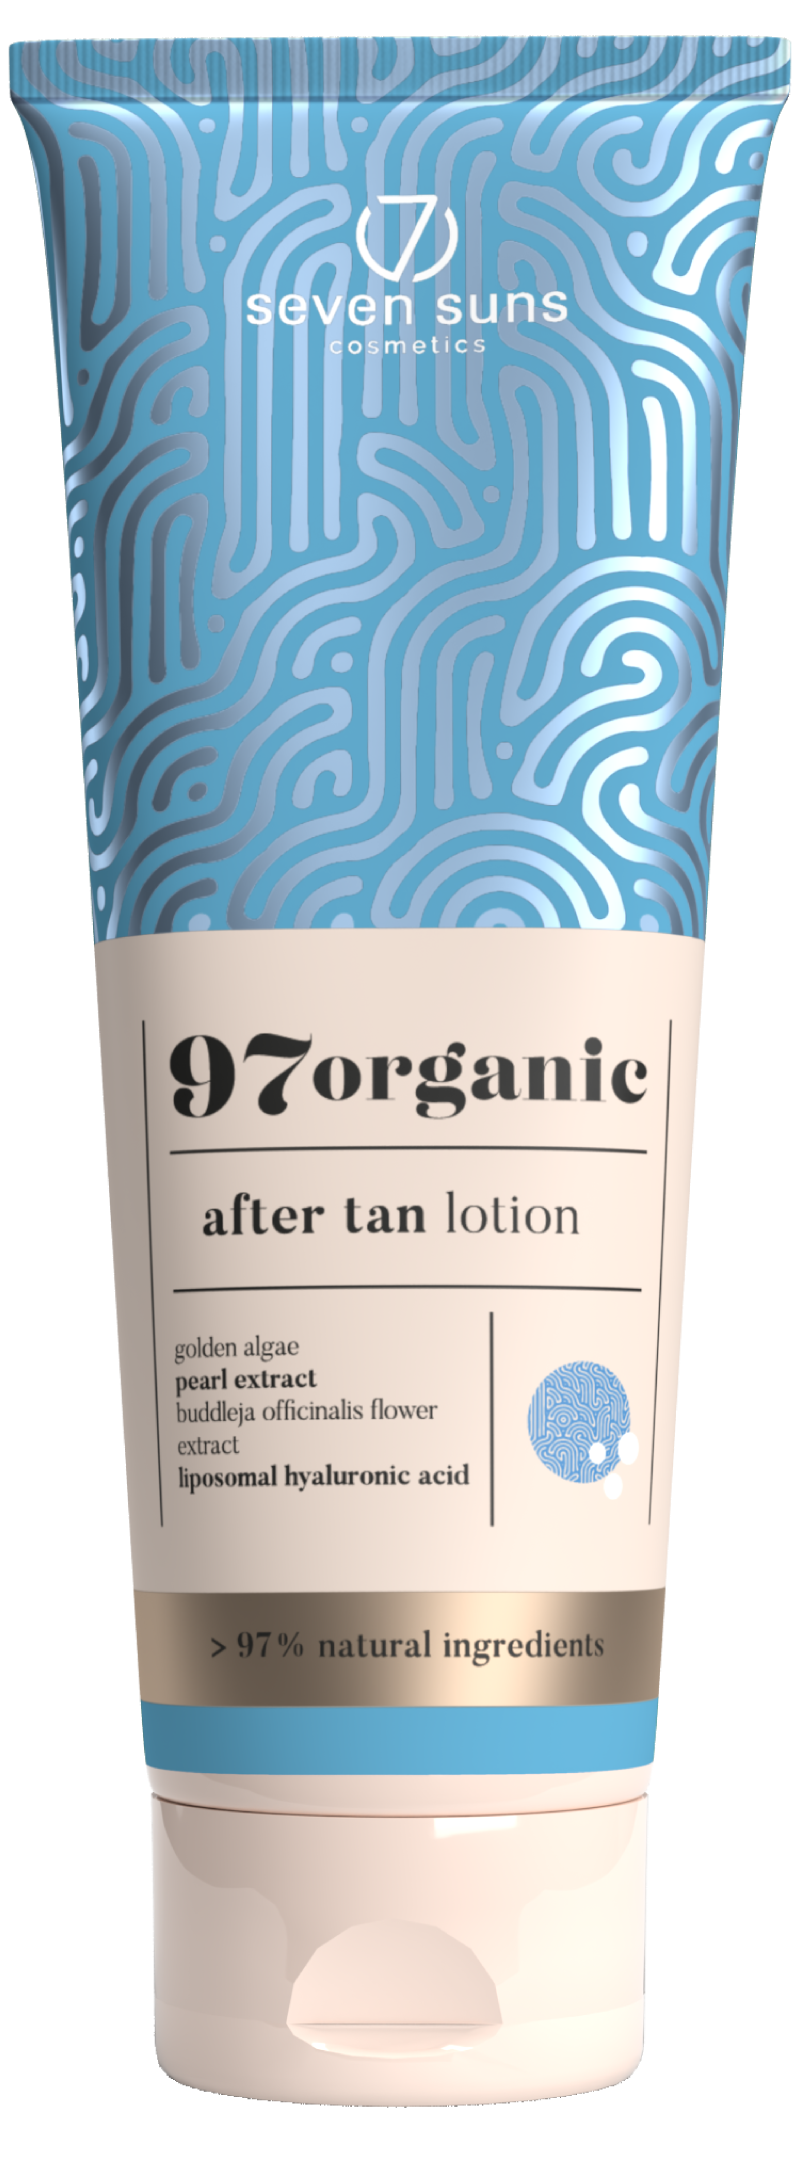 97organic After Tan Lotion